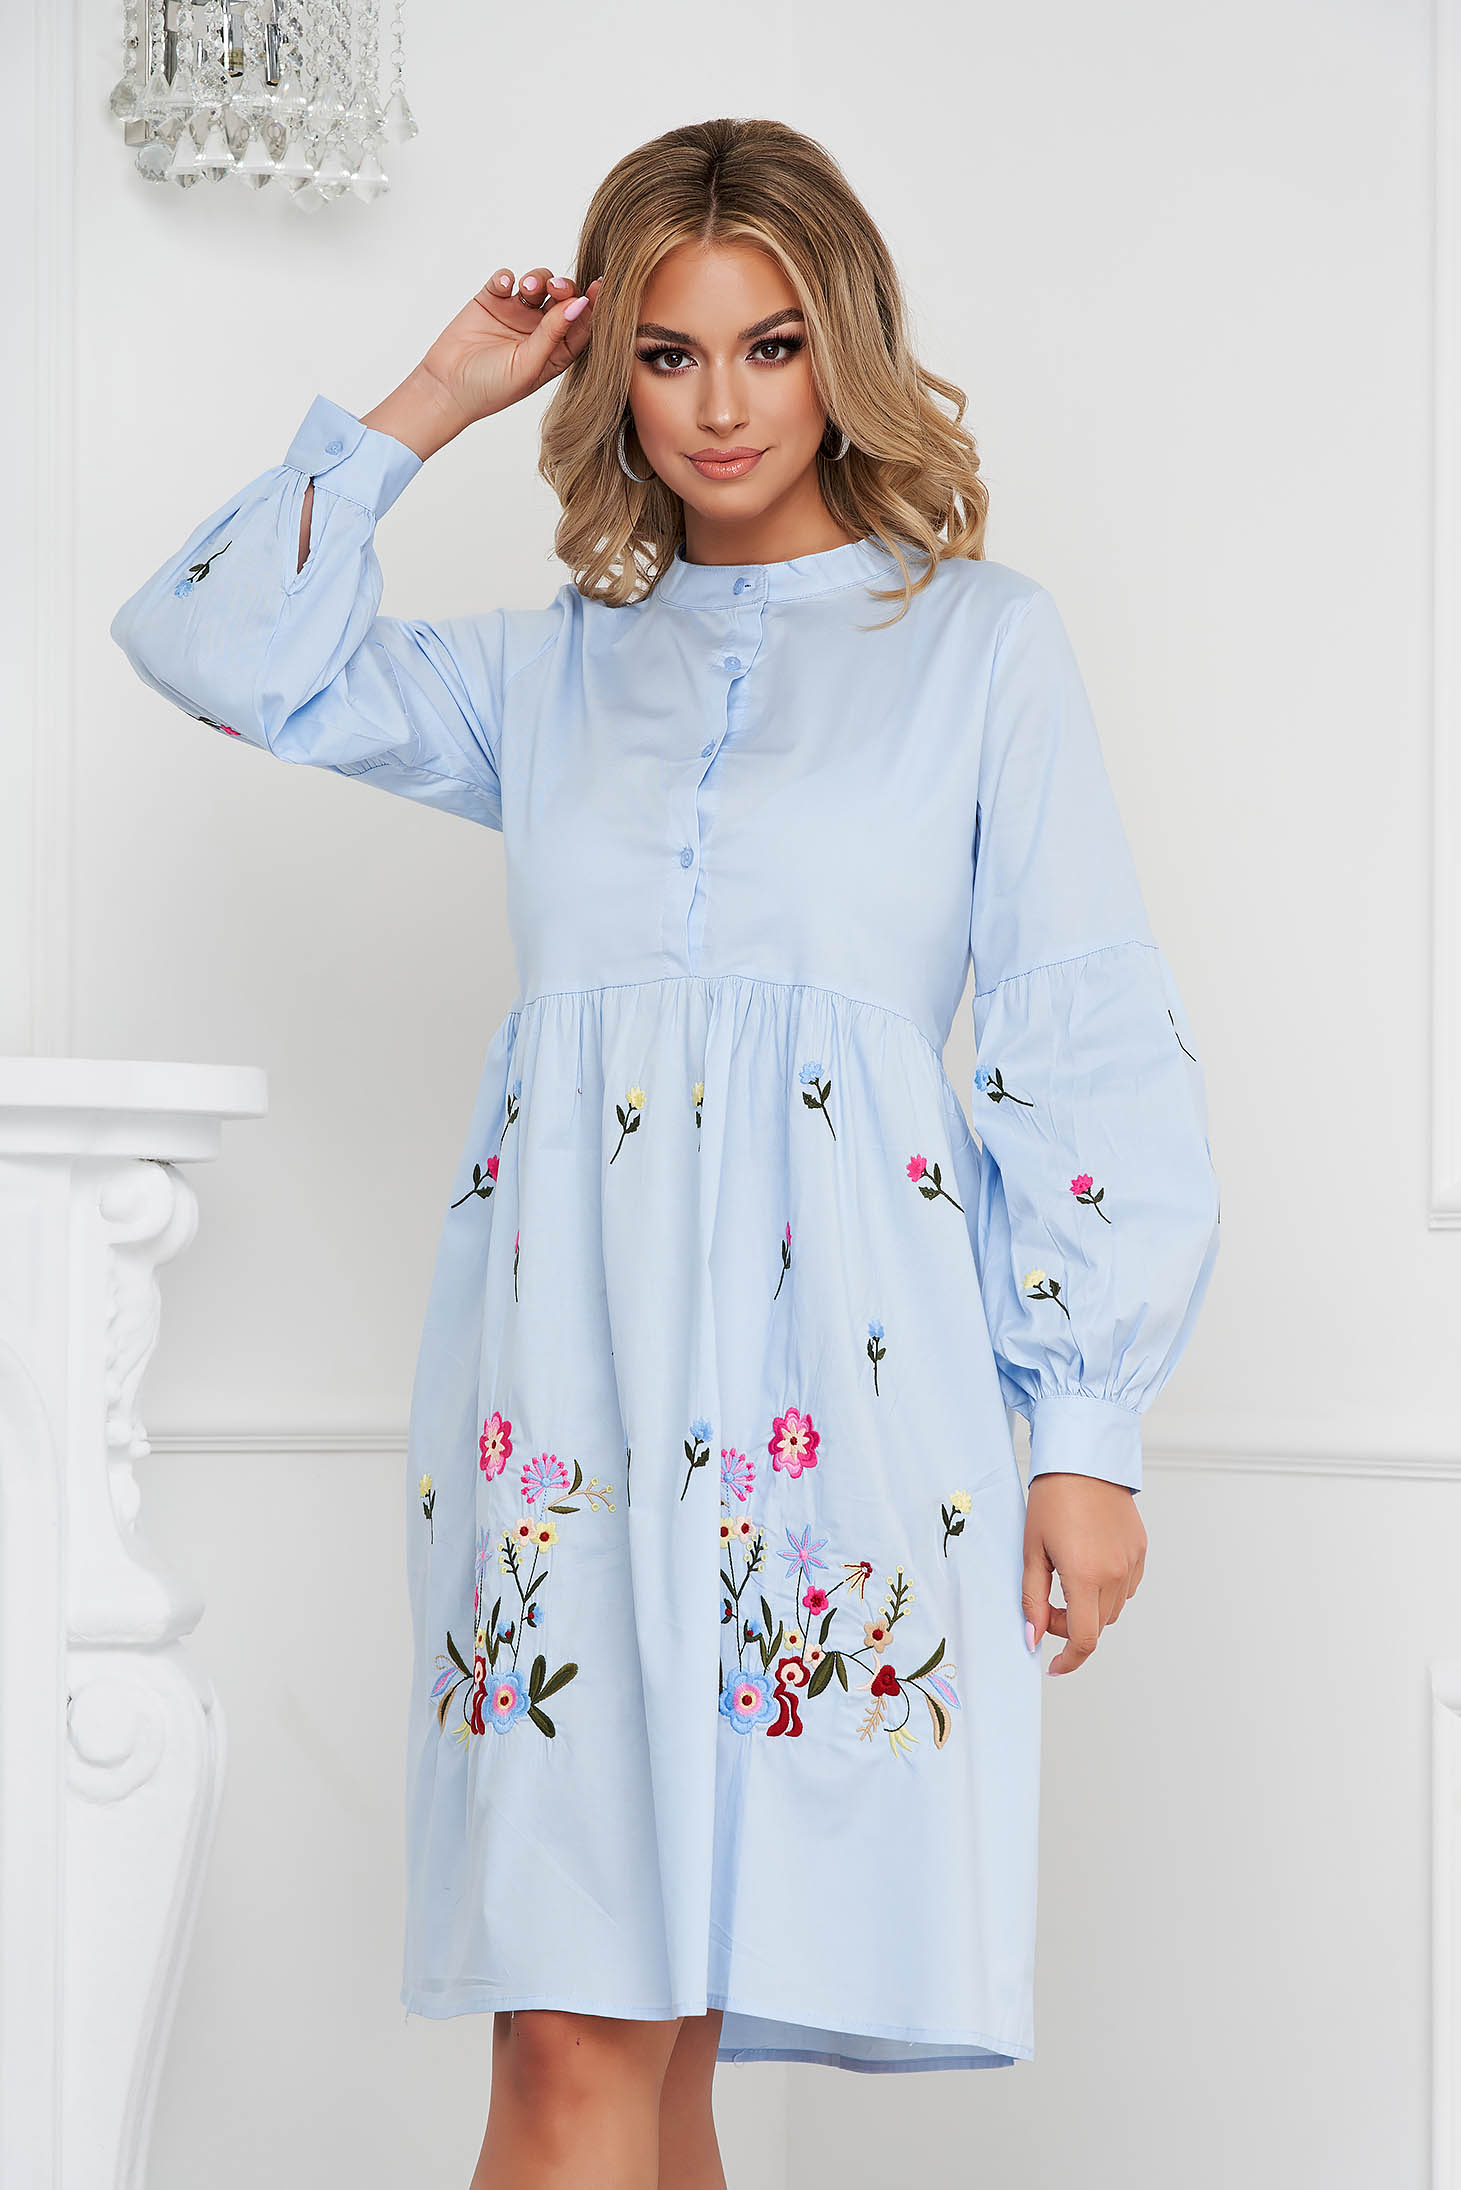 Rochie SunShine albastru-deschis midi din bumbac cu maneci bufante si broderie florala